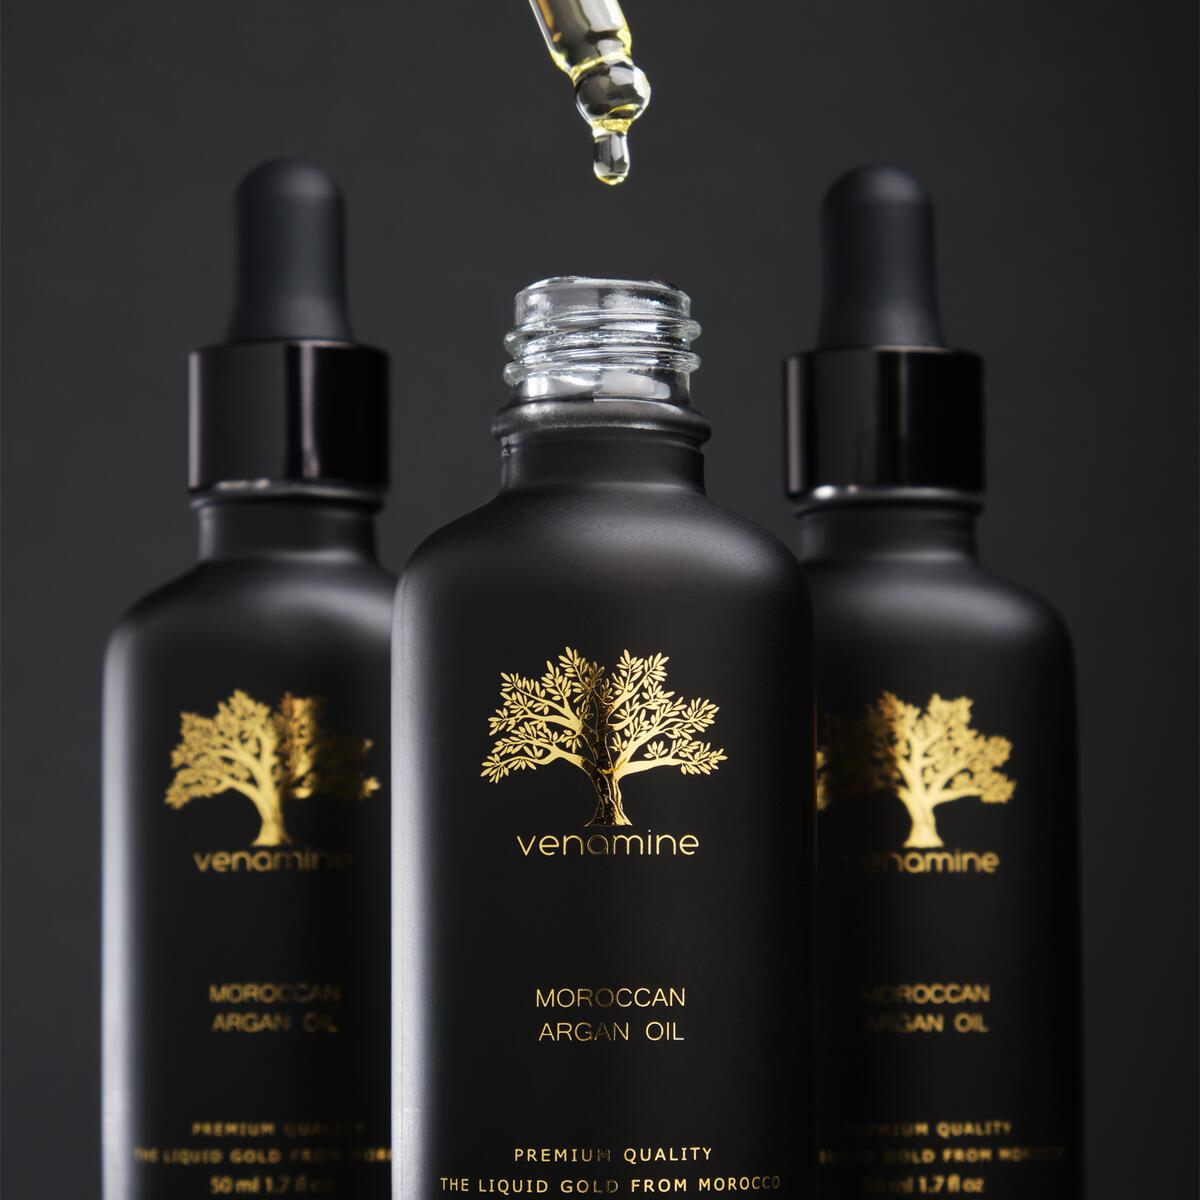 VENAMINE 100% Moroccan Argan Oil USDA Certified Organic (1.7oz / 50mL) Pure Cold Pressed Extra Virgin Premium Moisturizer